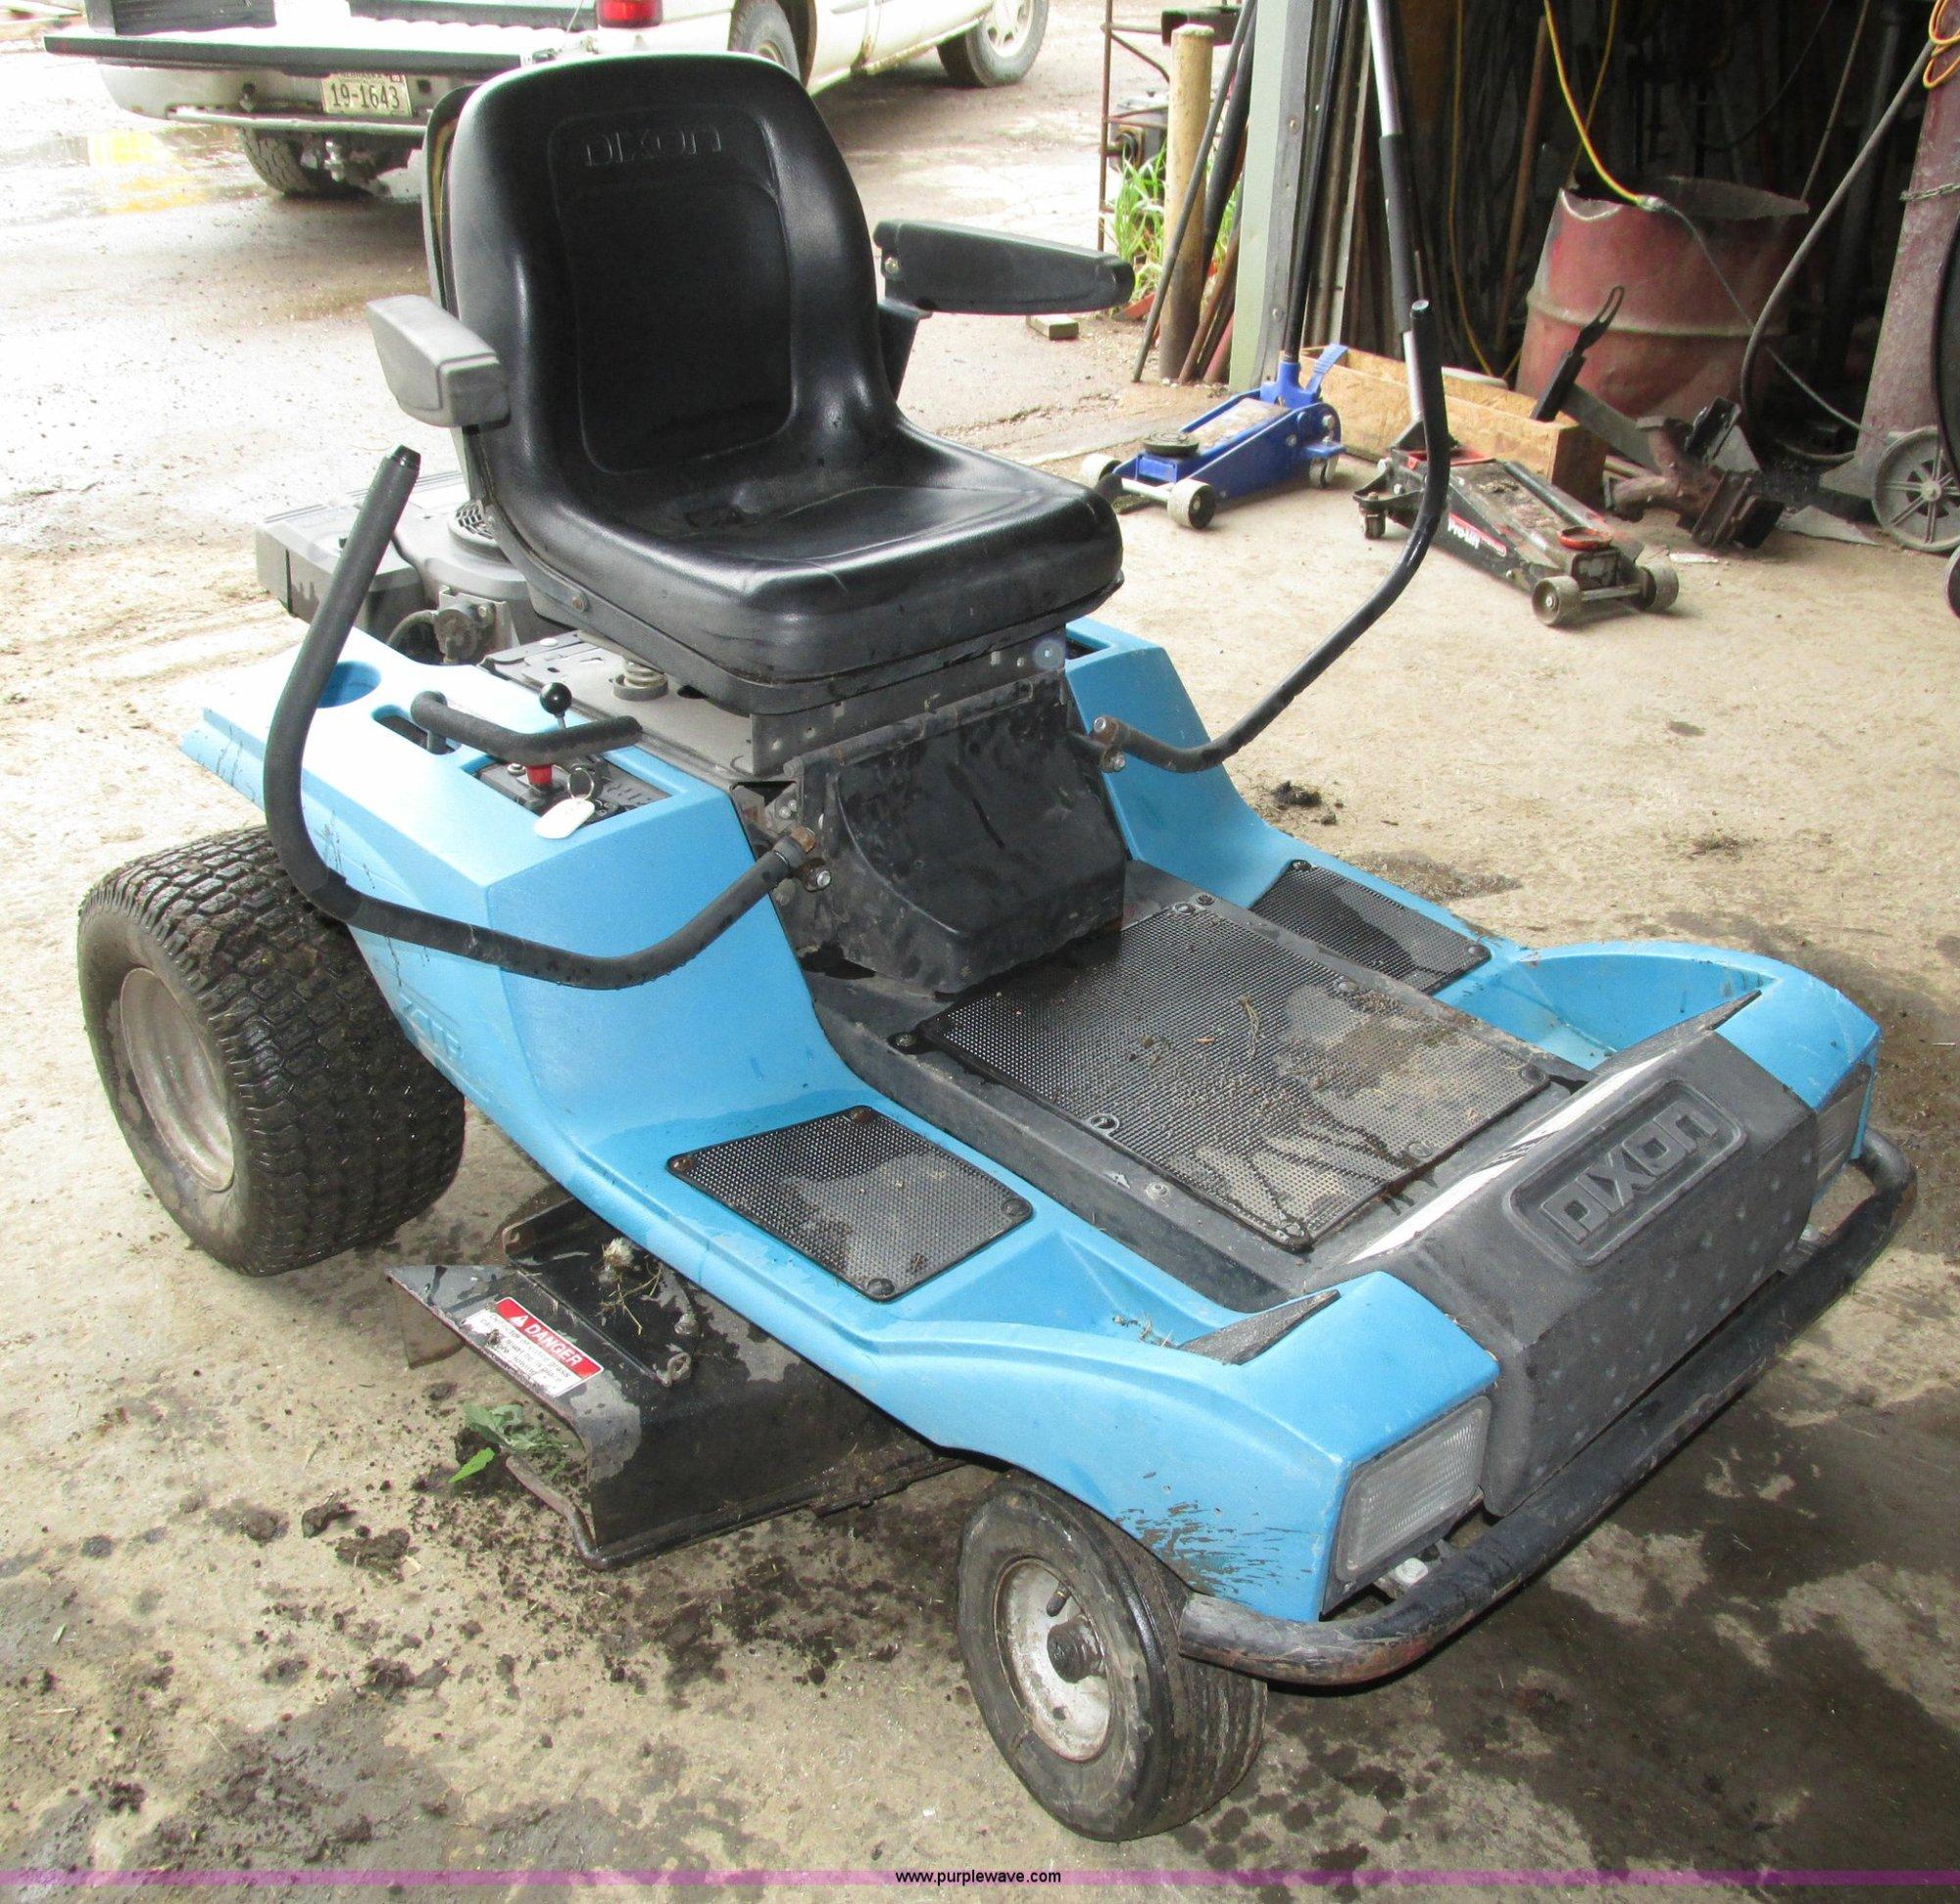 hight resolution of dixon 4515b ztr lawn mower for sale in nebraska